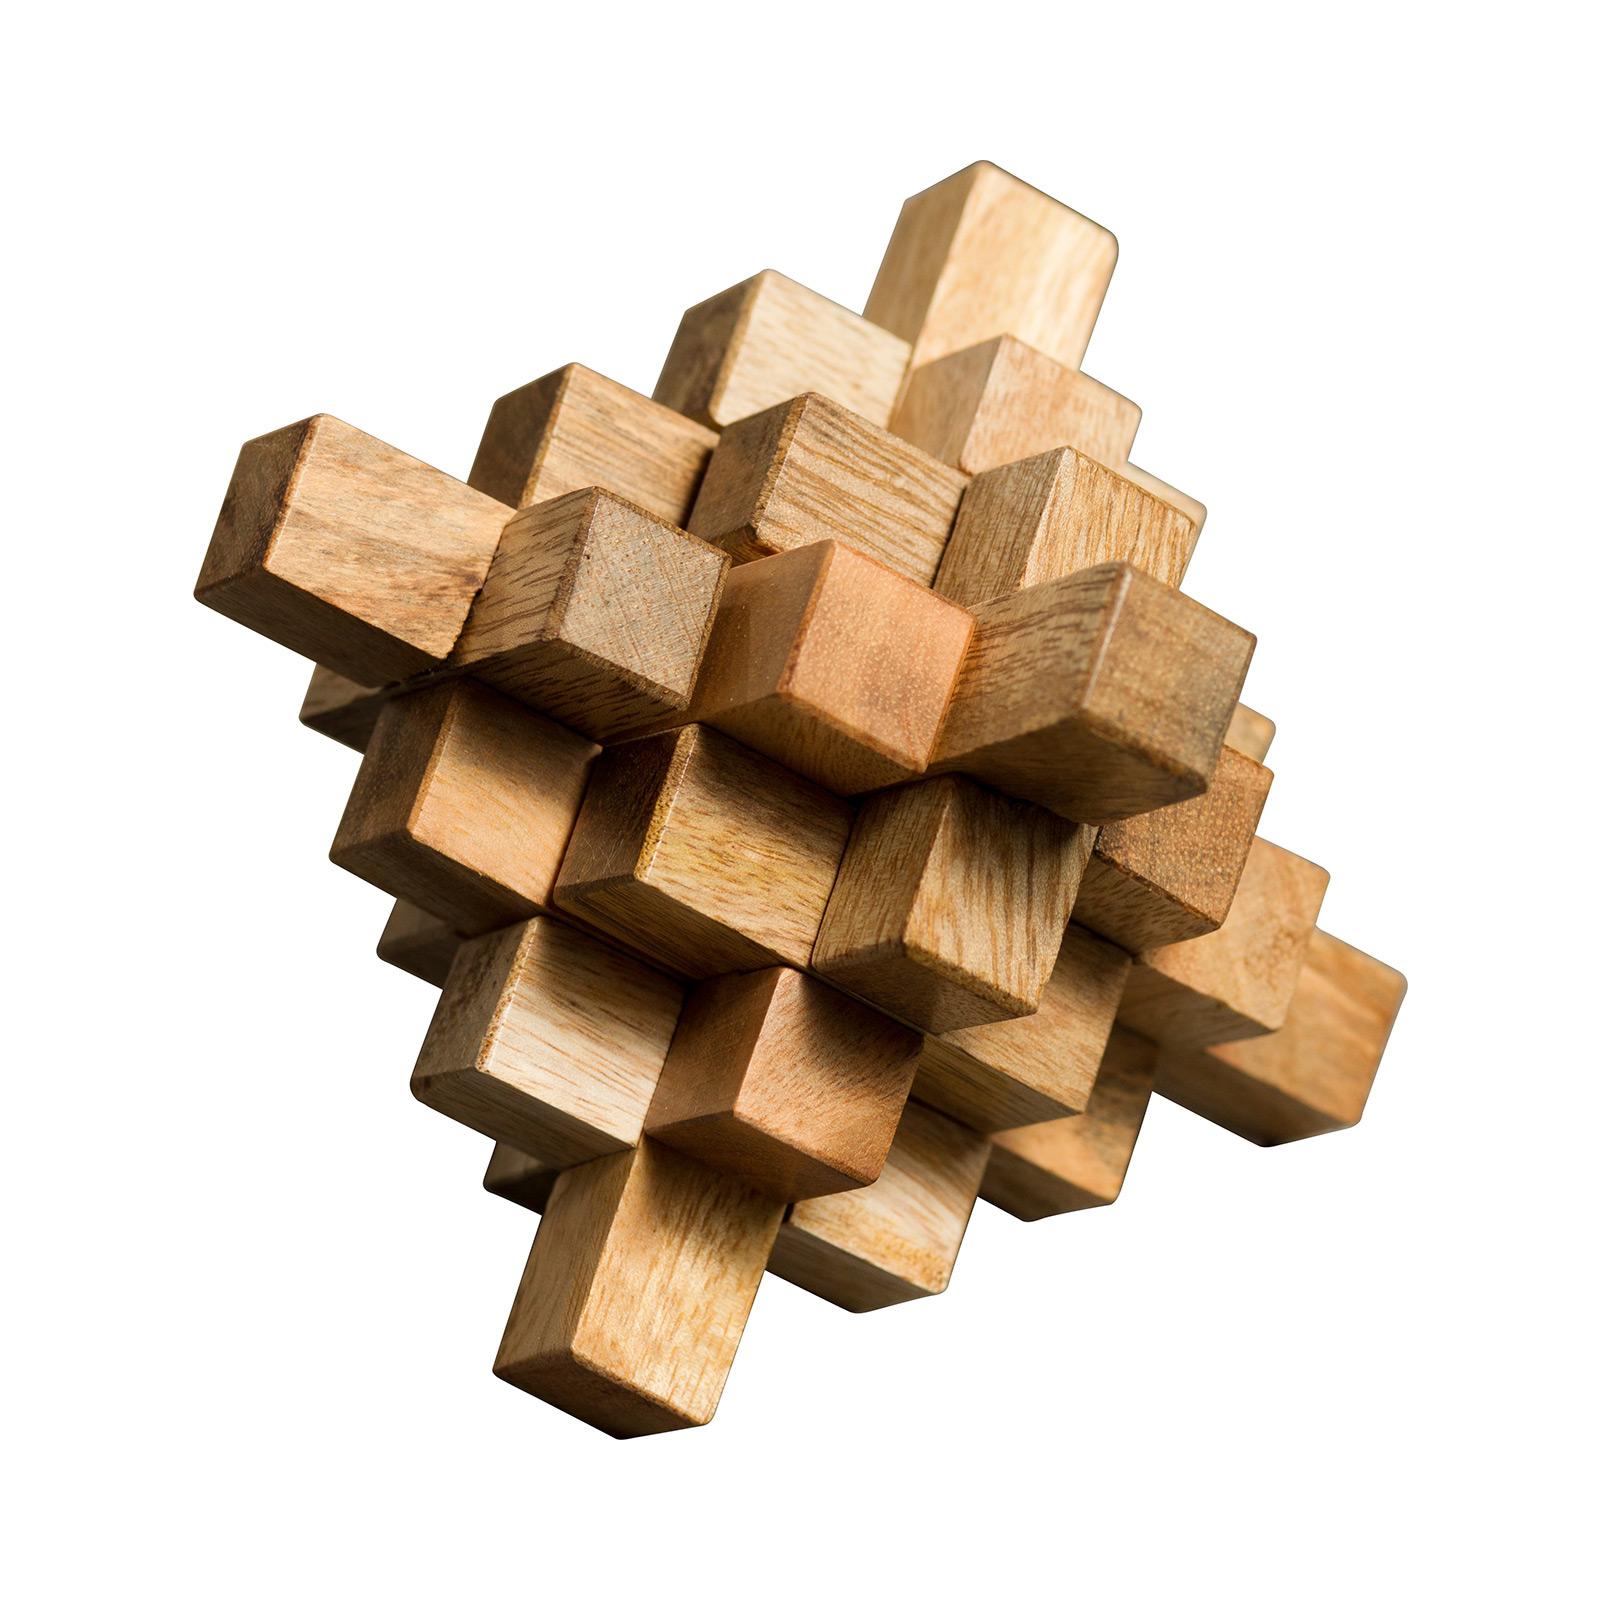 Wood Geometric Puzzle